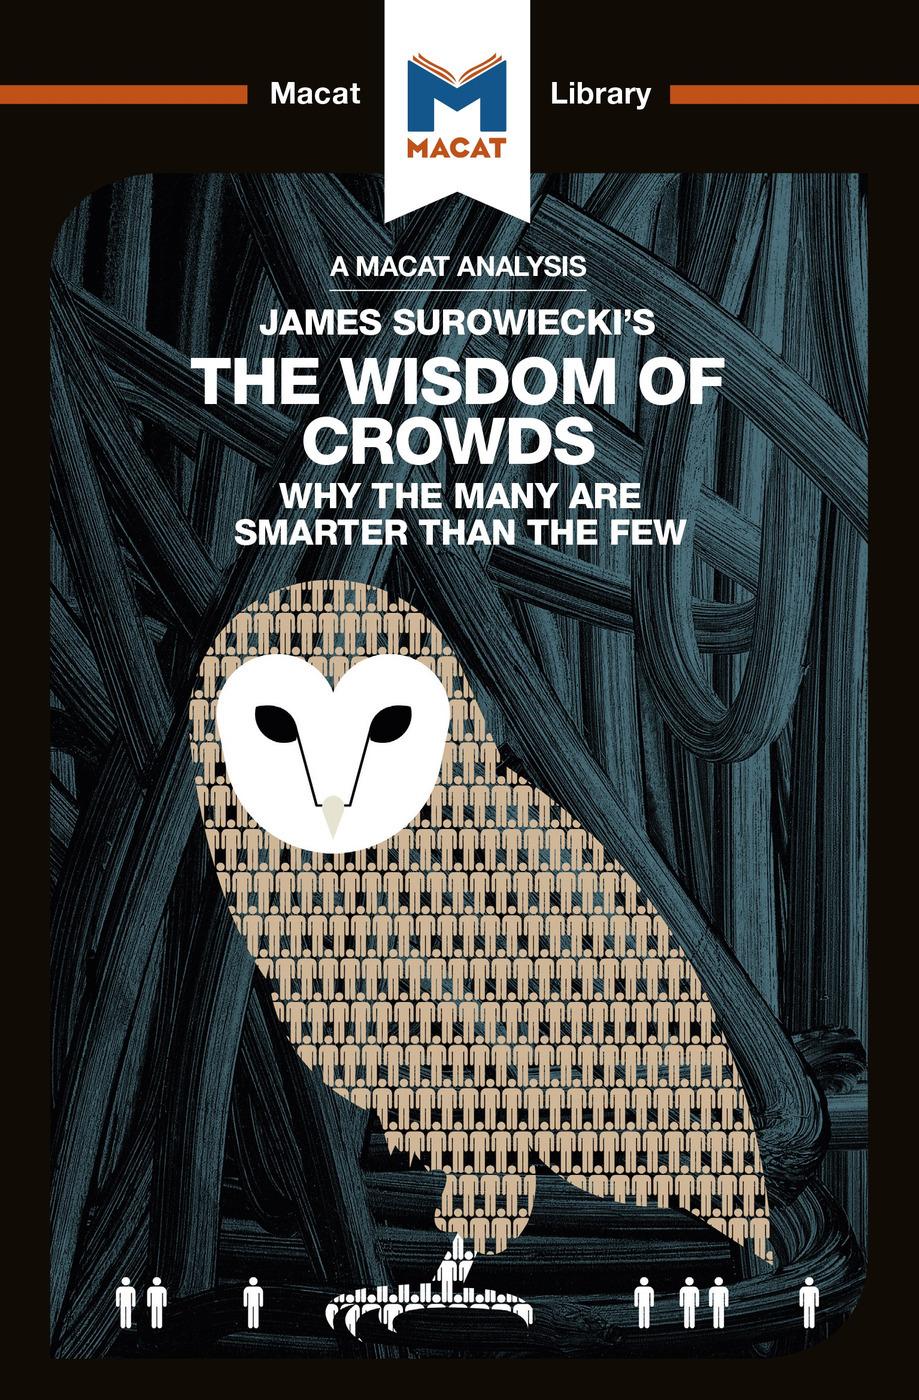 Download The Wisdom Of Crowds By James Surowiecki